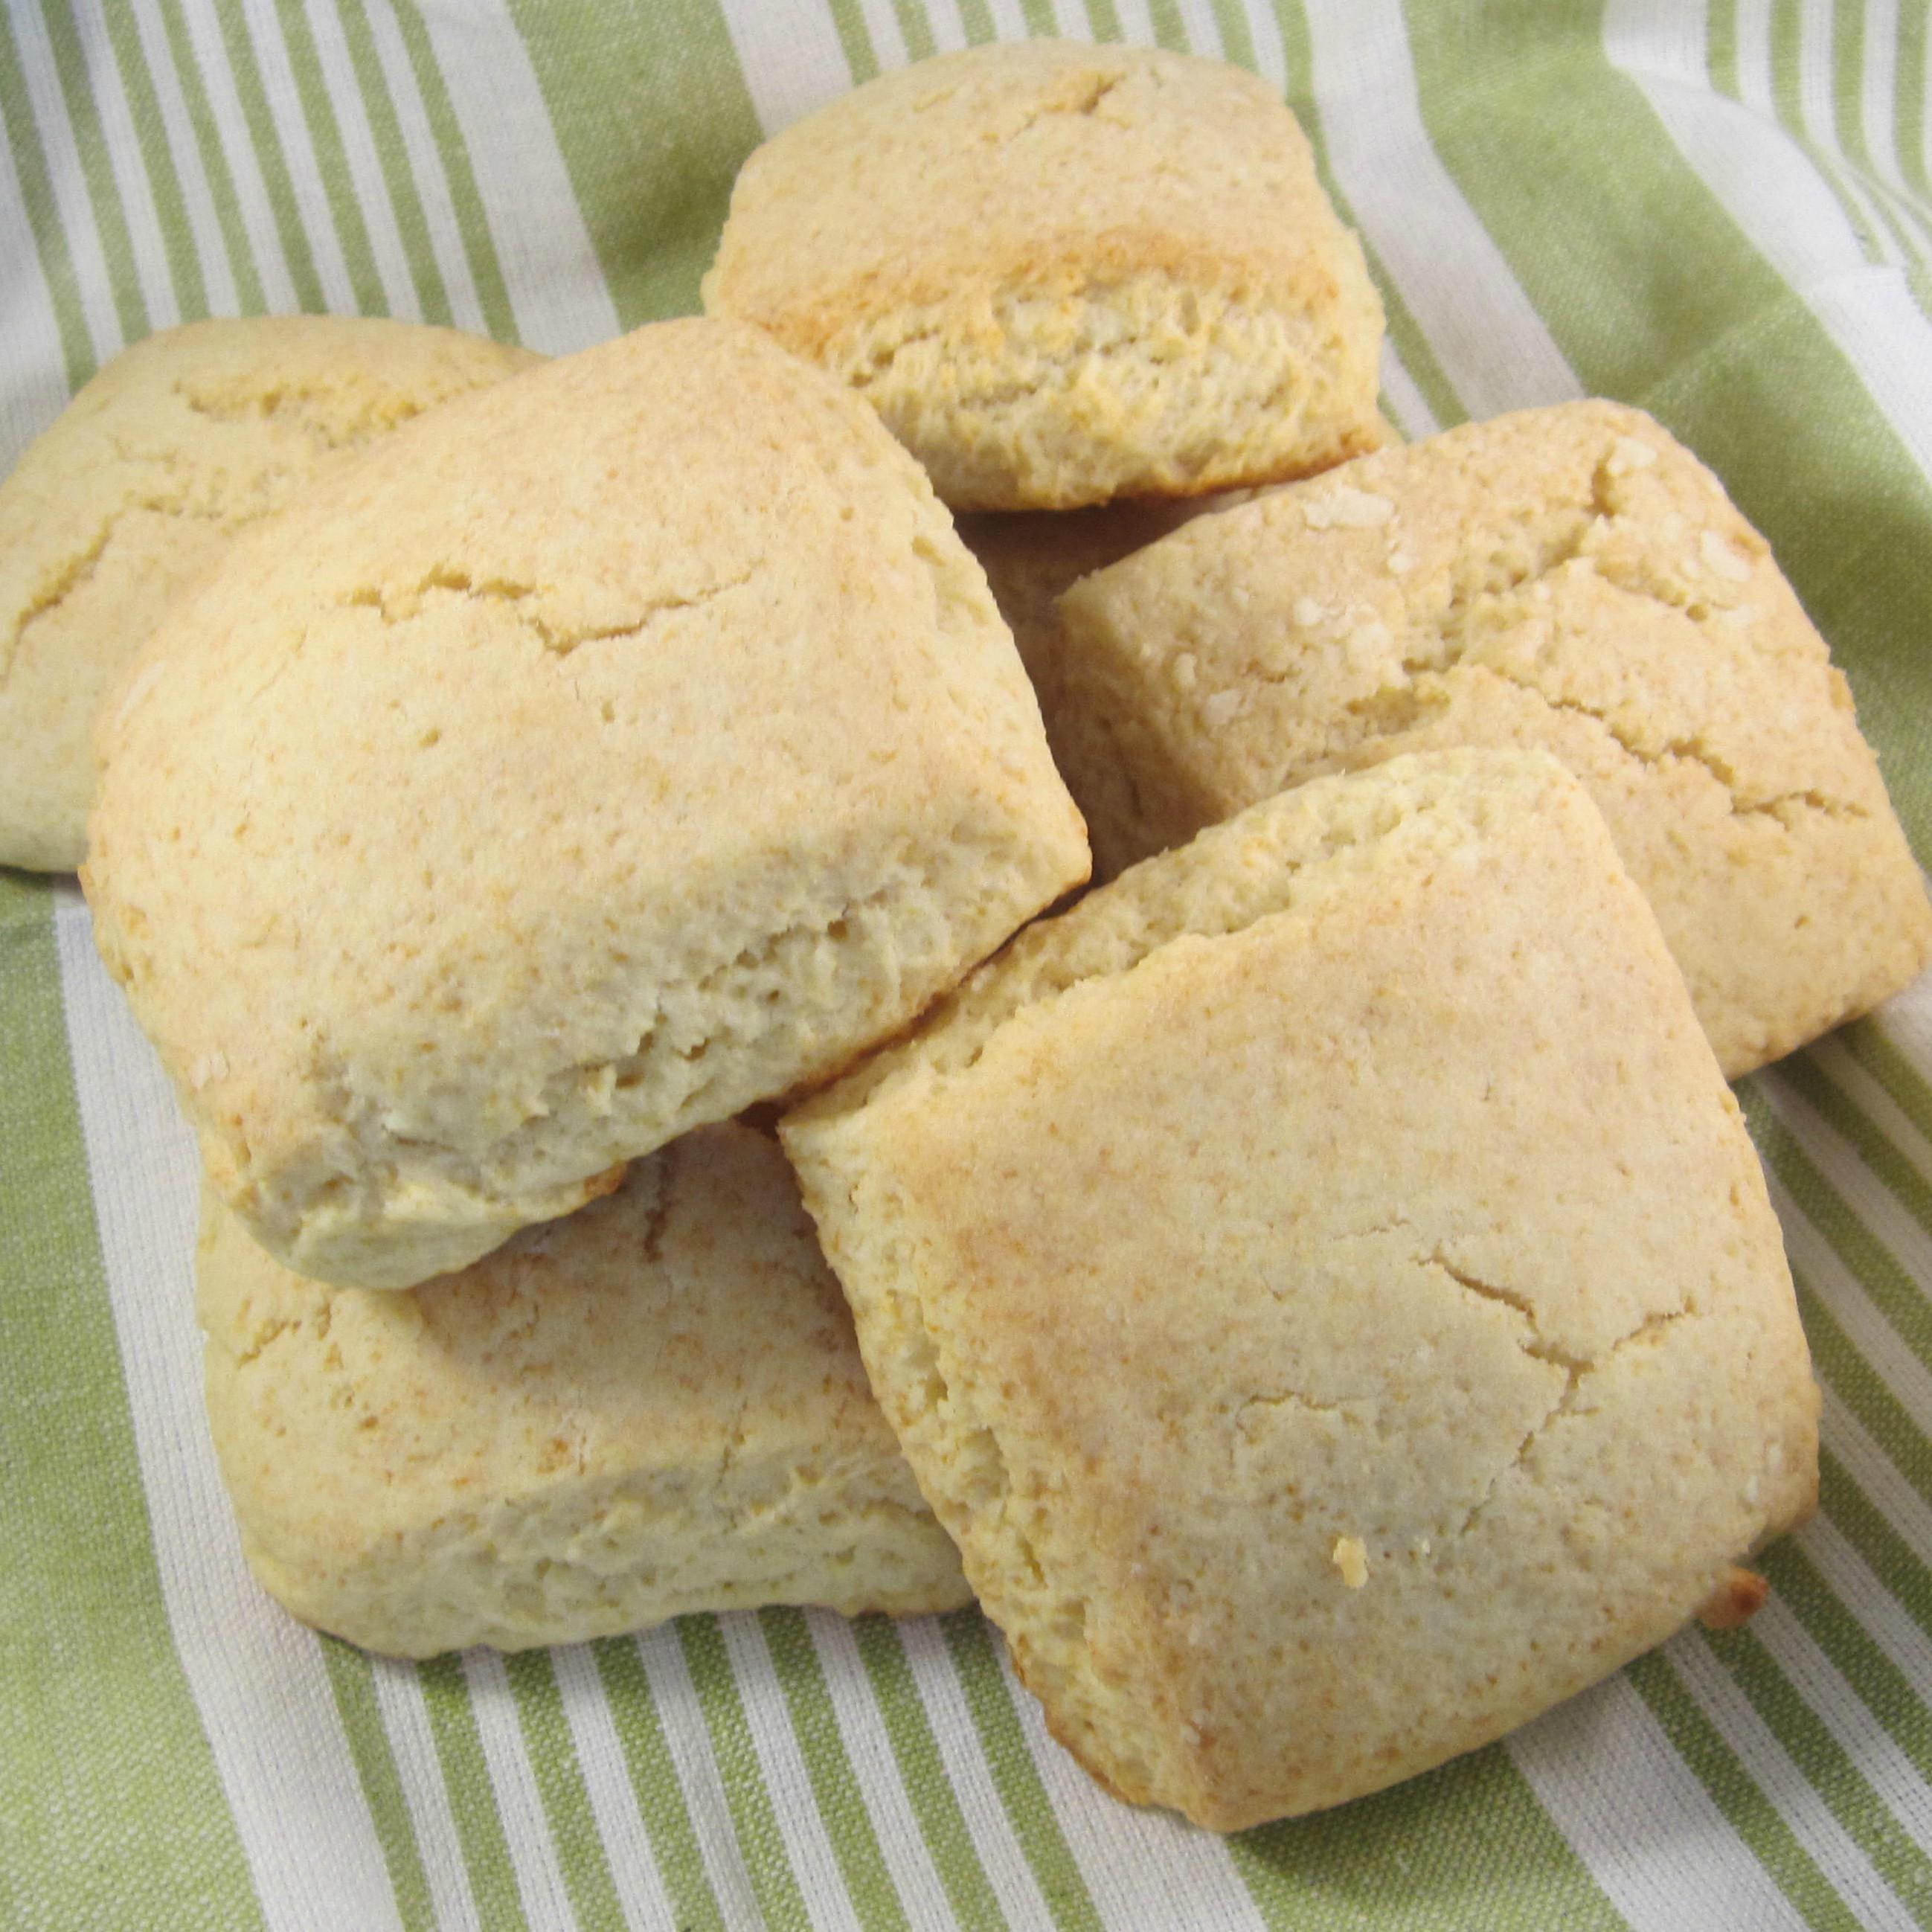 Grandma's Baking Powder Biscuits